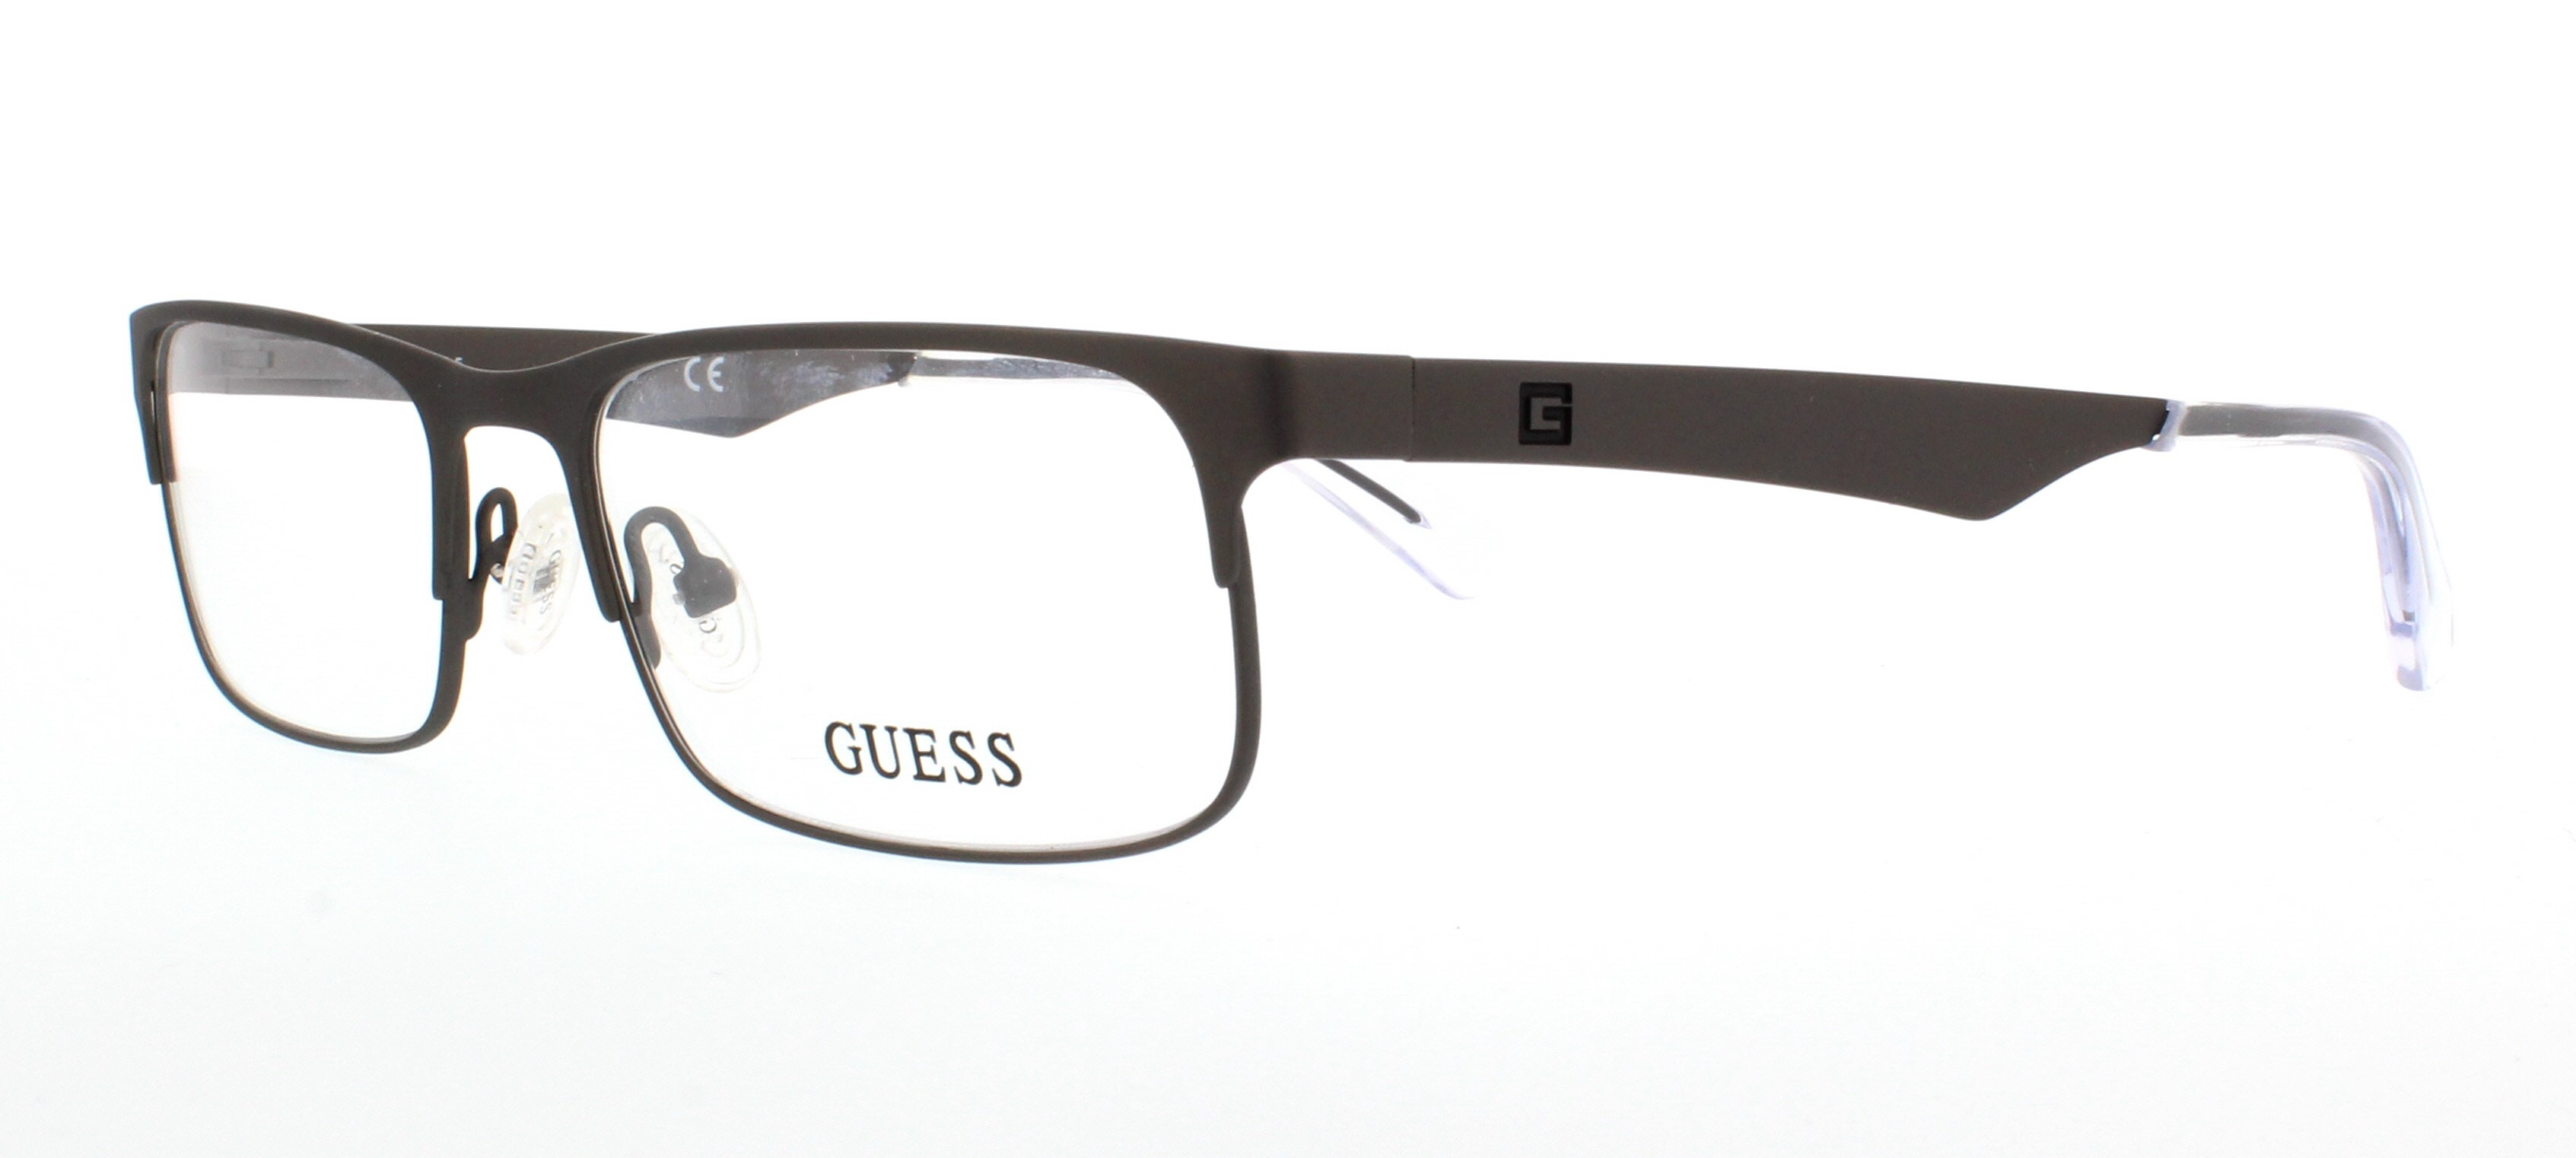 Eyeglasses Guess GU 1904 091 matte blue